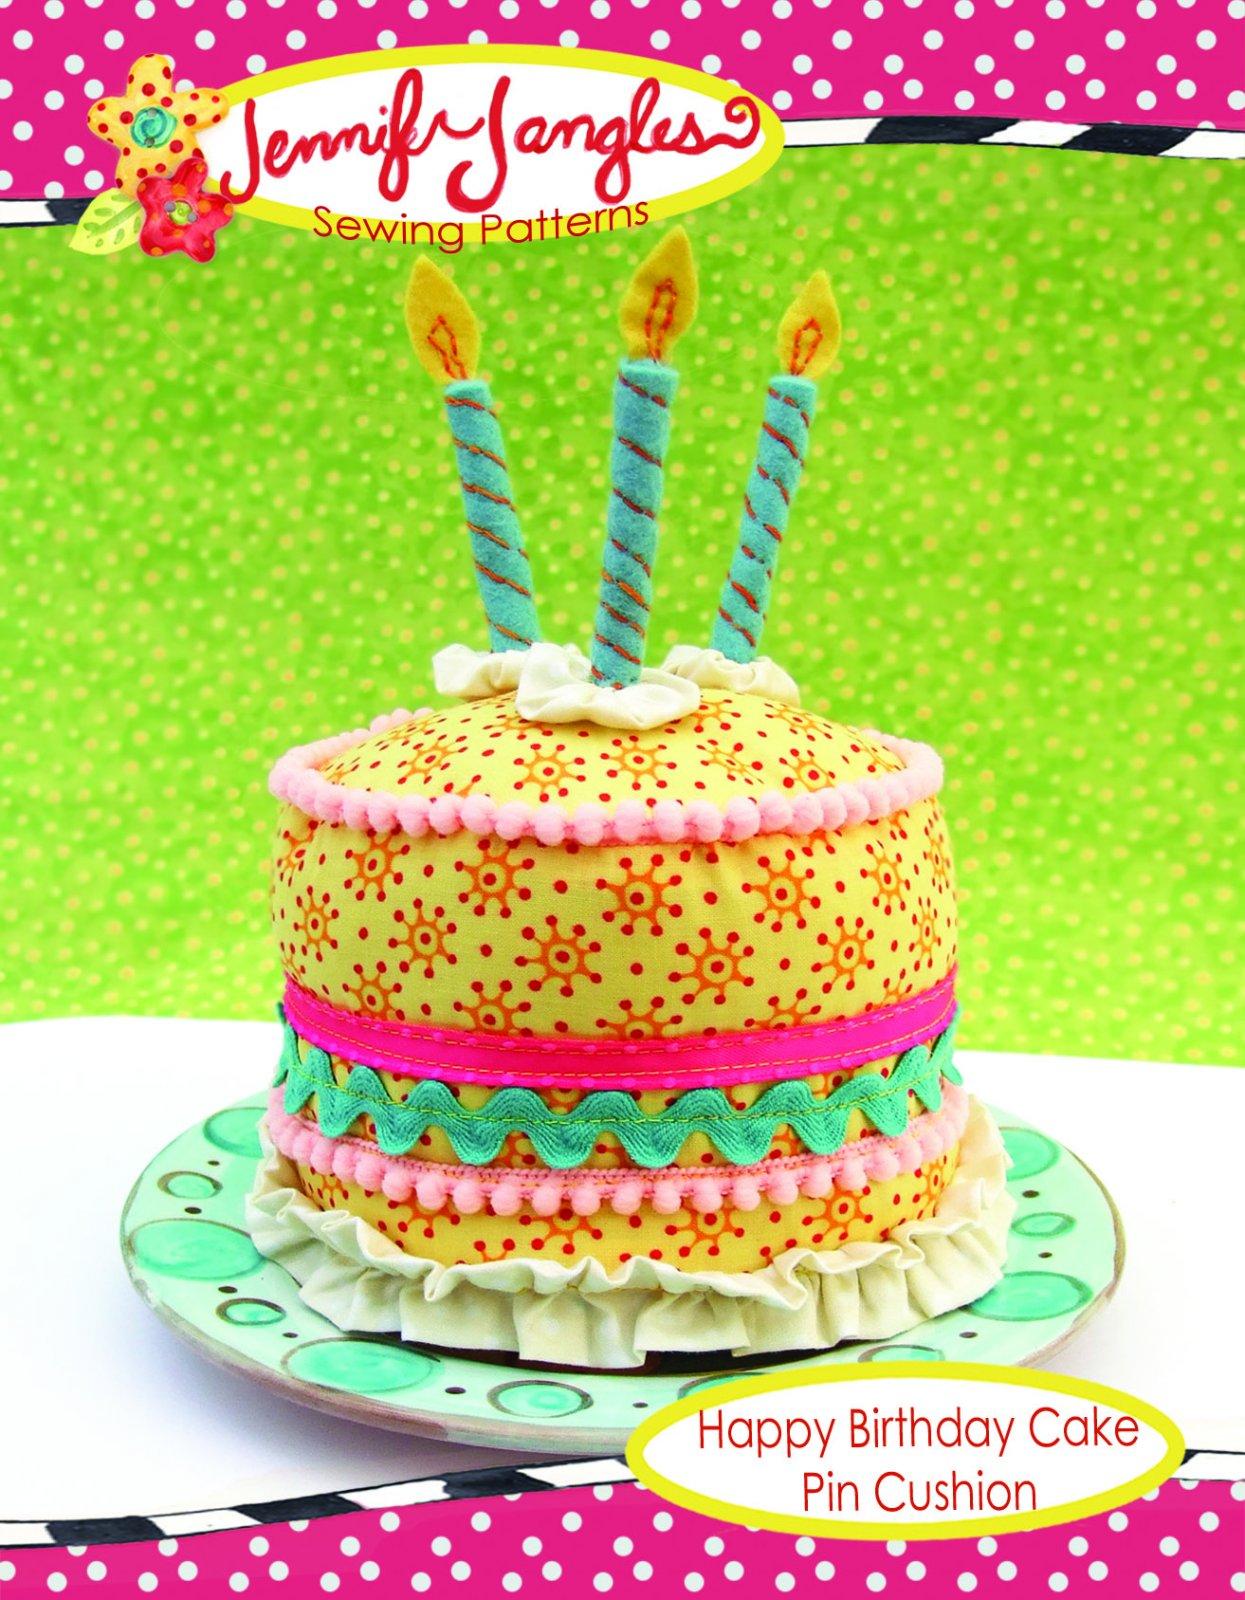 Happy Birthday Cake Pincushion Pattern